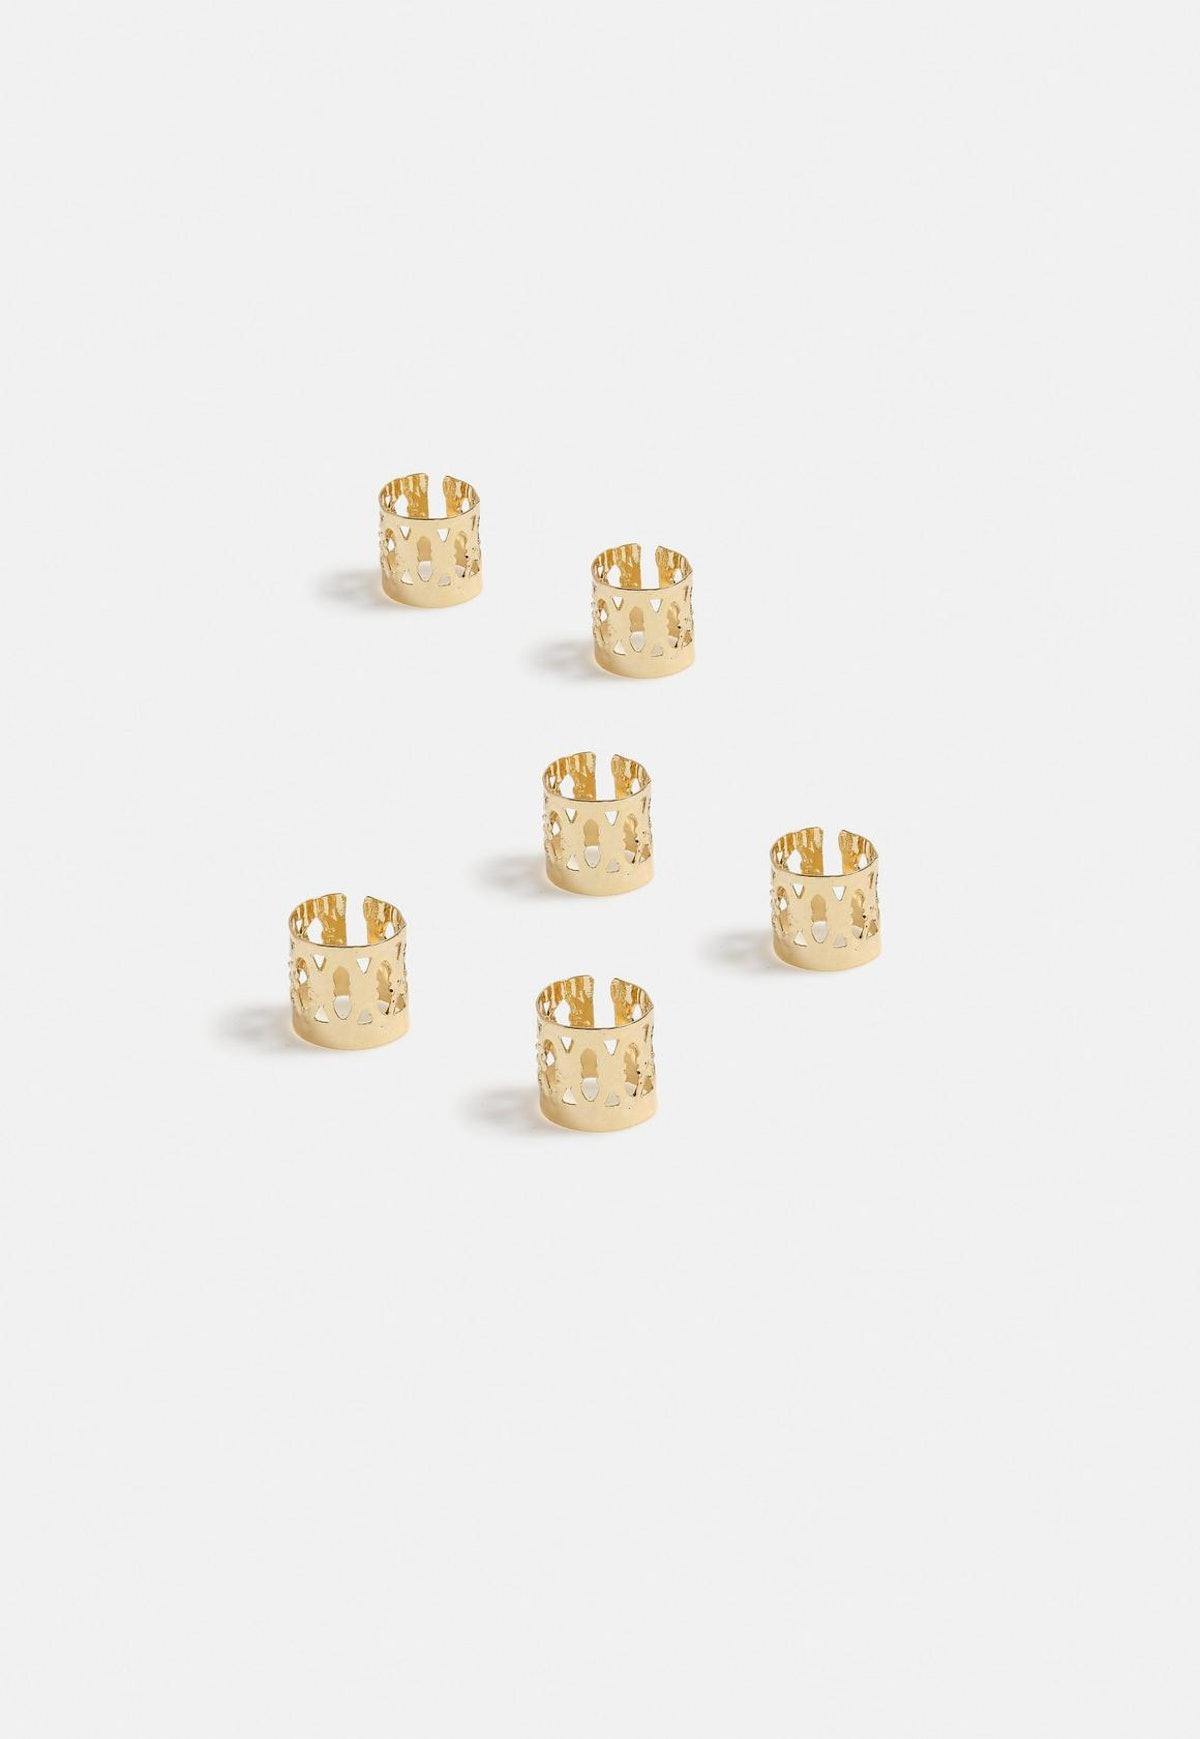 Gold Look Hair Clamp Rings